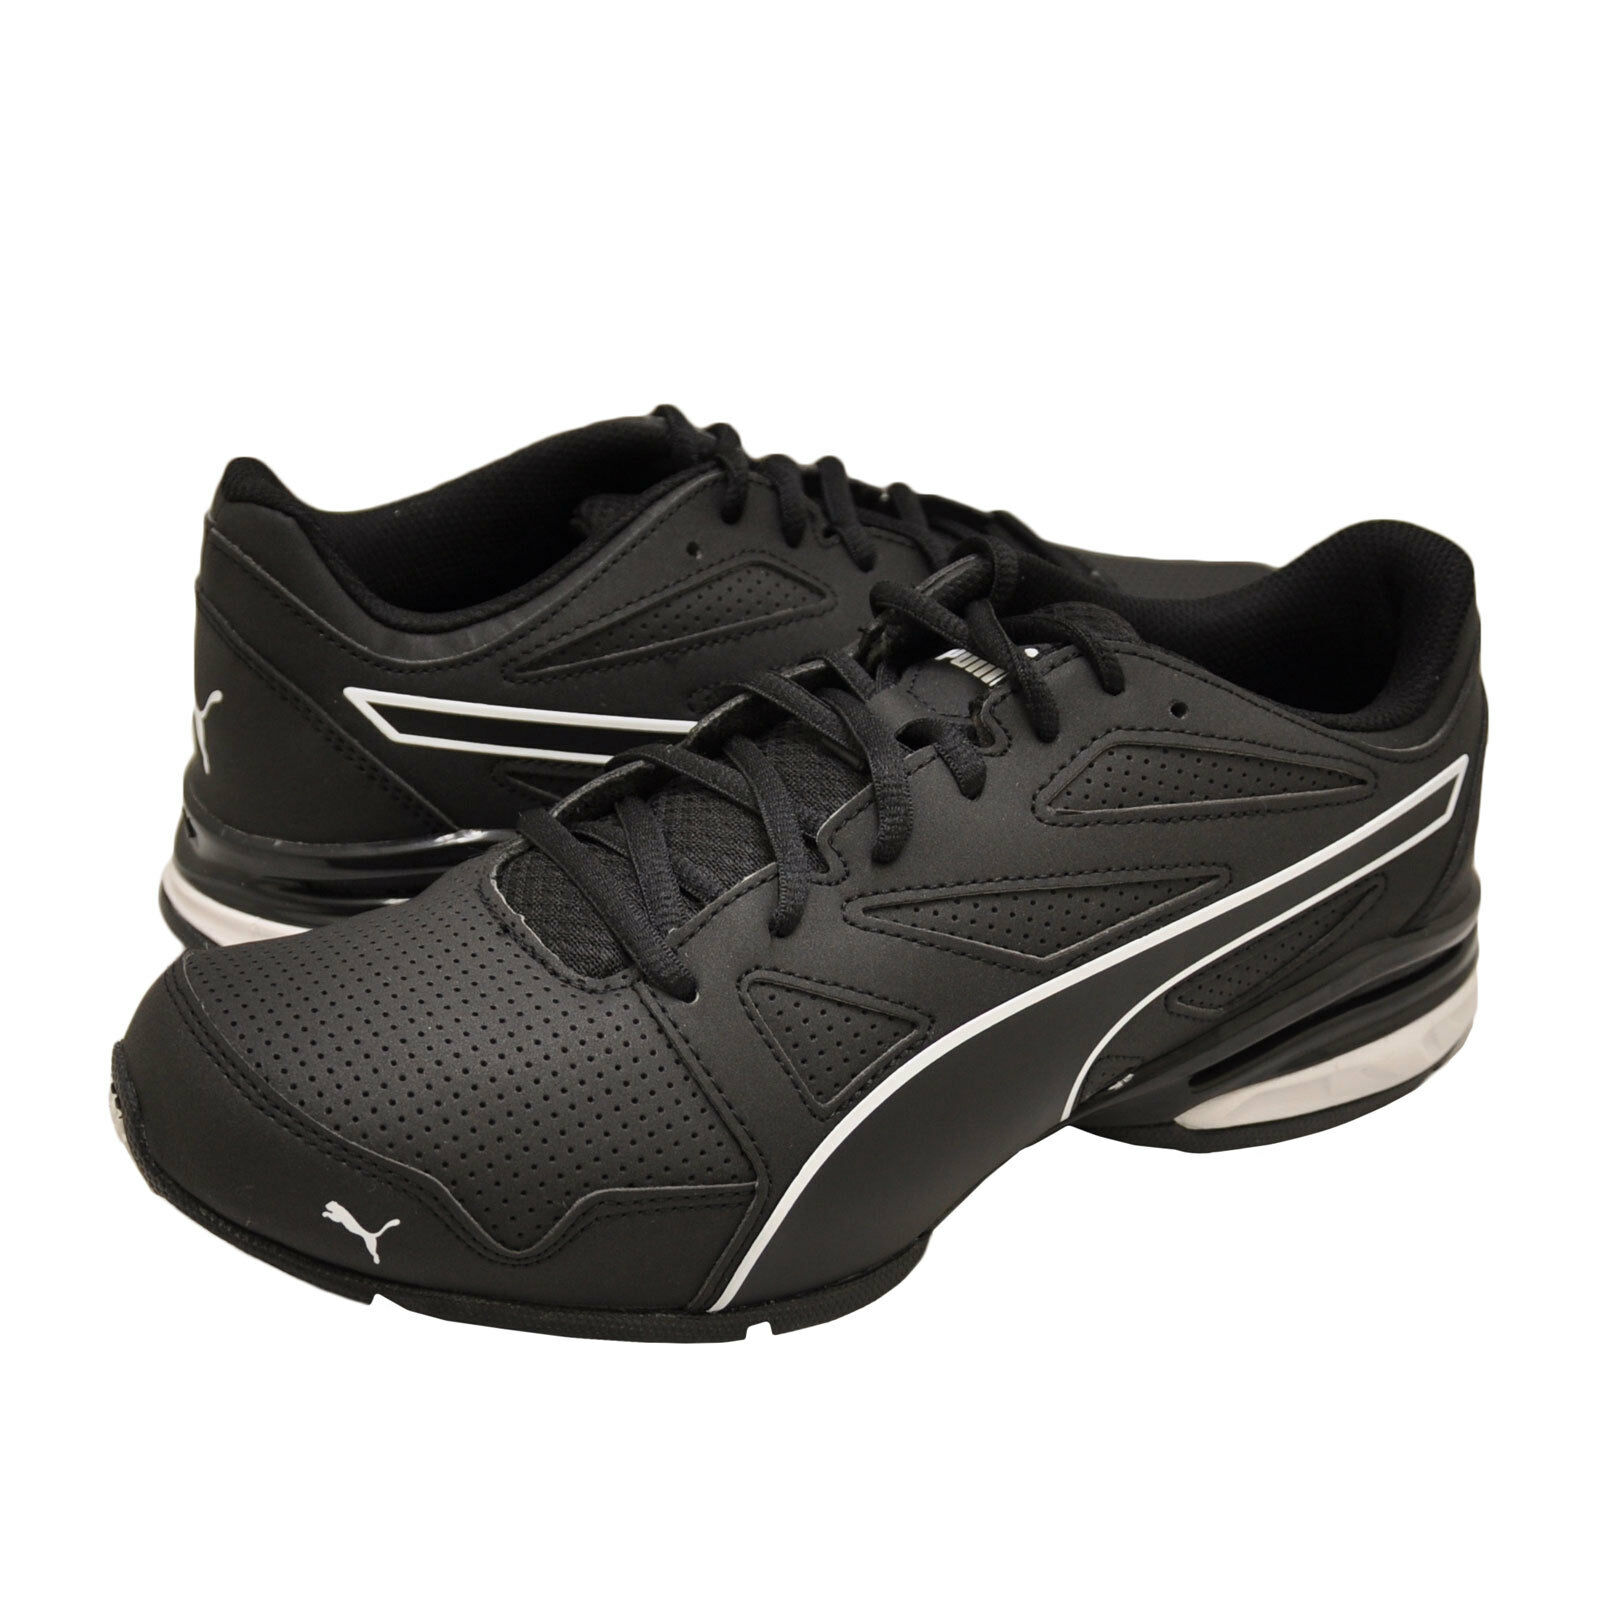 hommes Chaussures PUMA Tazon Modern SL FM Sneaker 190296-12 noir / blanc New